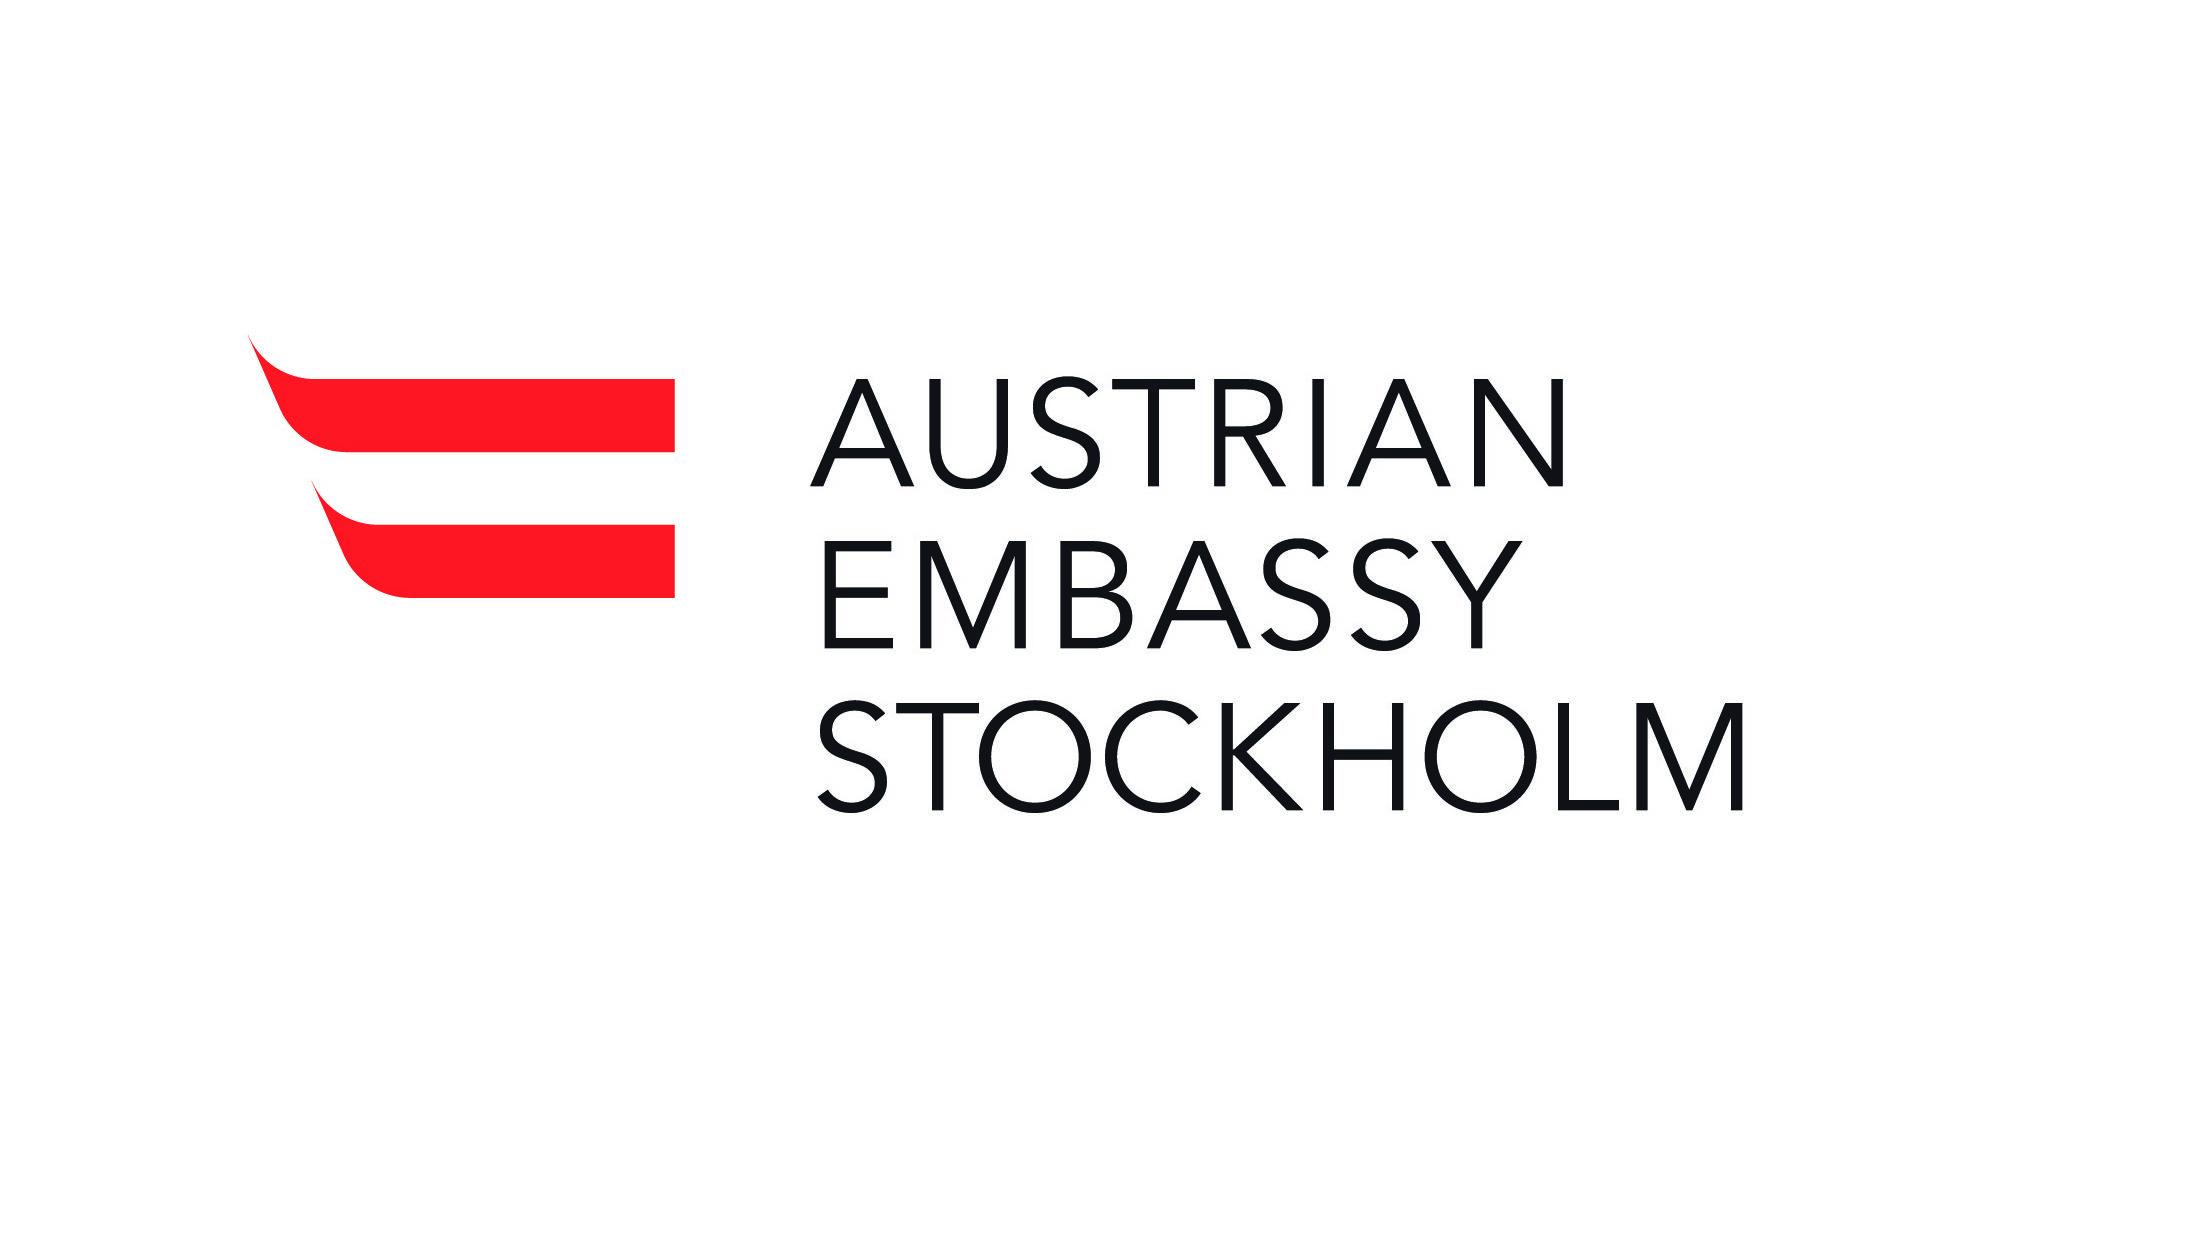 The Austrian Embassy Stockholm